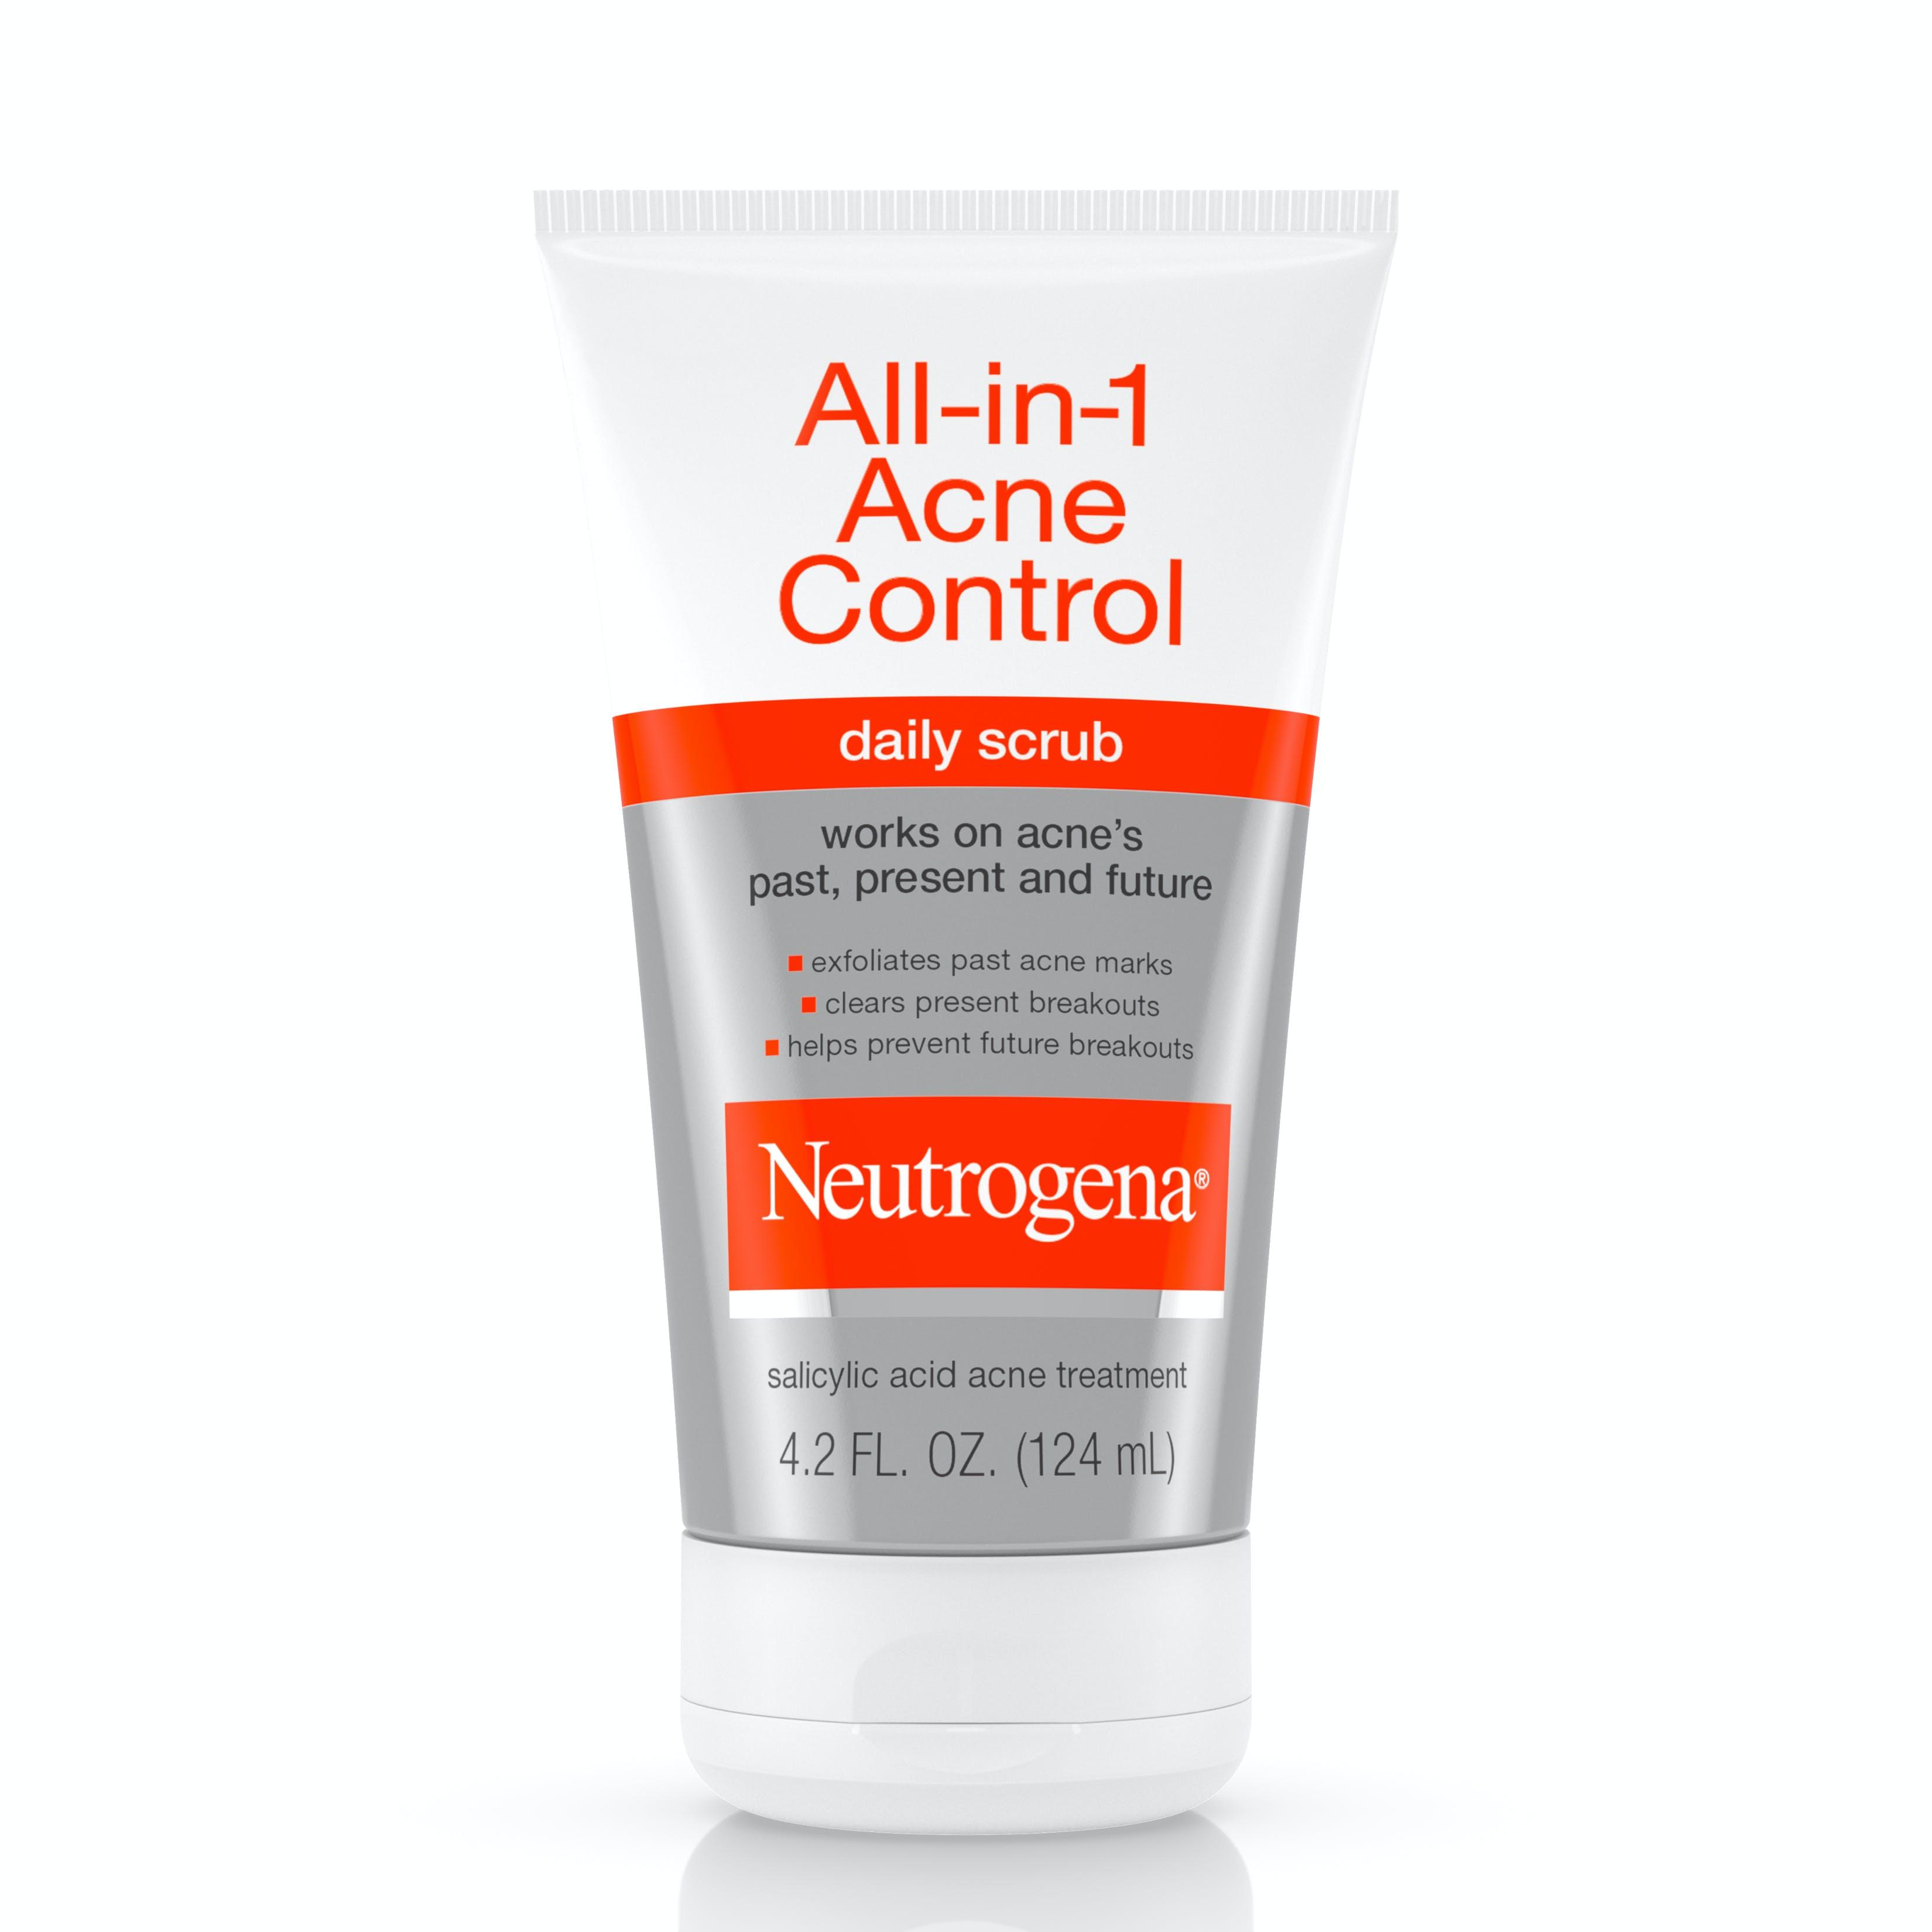 neutrogena all products